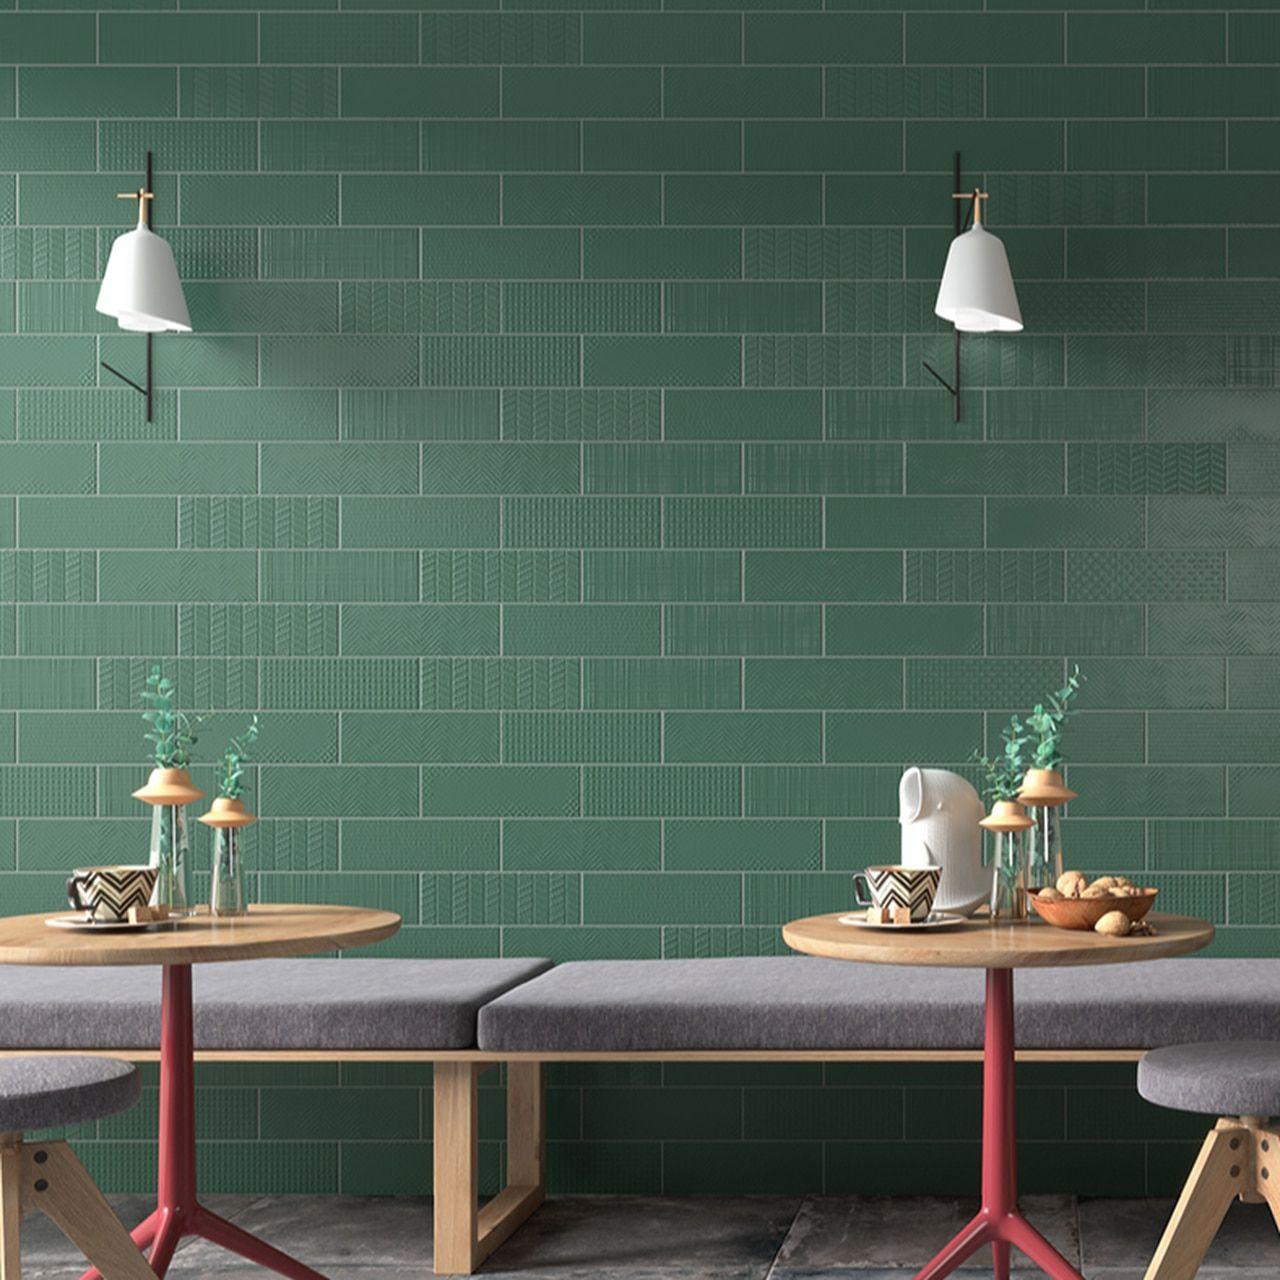 Contempo 4 X 12 Matte Green Blitz Deco Porcelain Wall Tile On Sale 4 39 Sq Ft In 2020 Porcelain Wall Tile Wall Tiles Deco